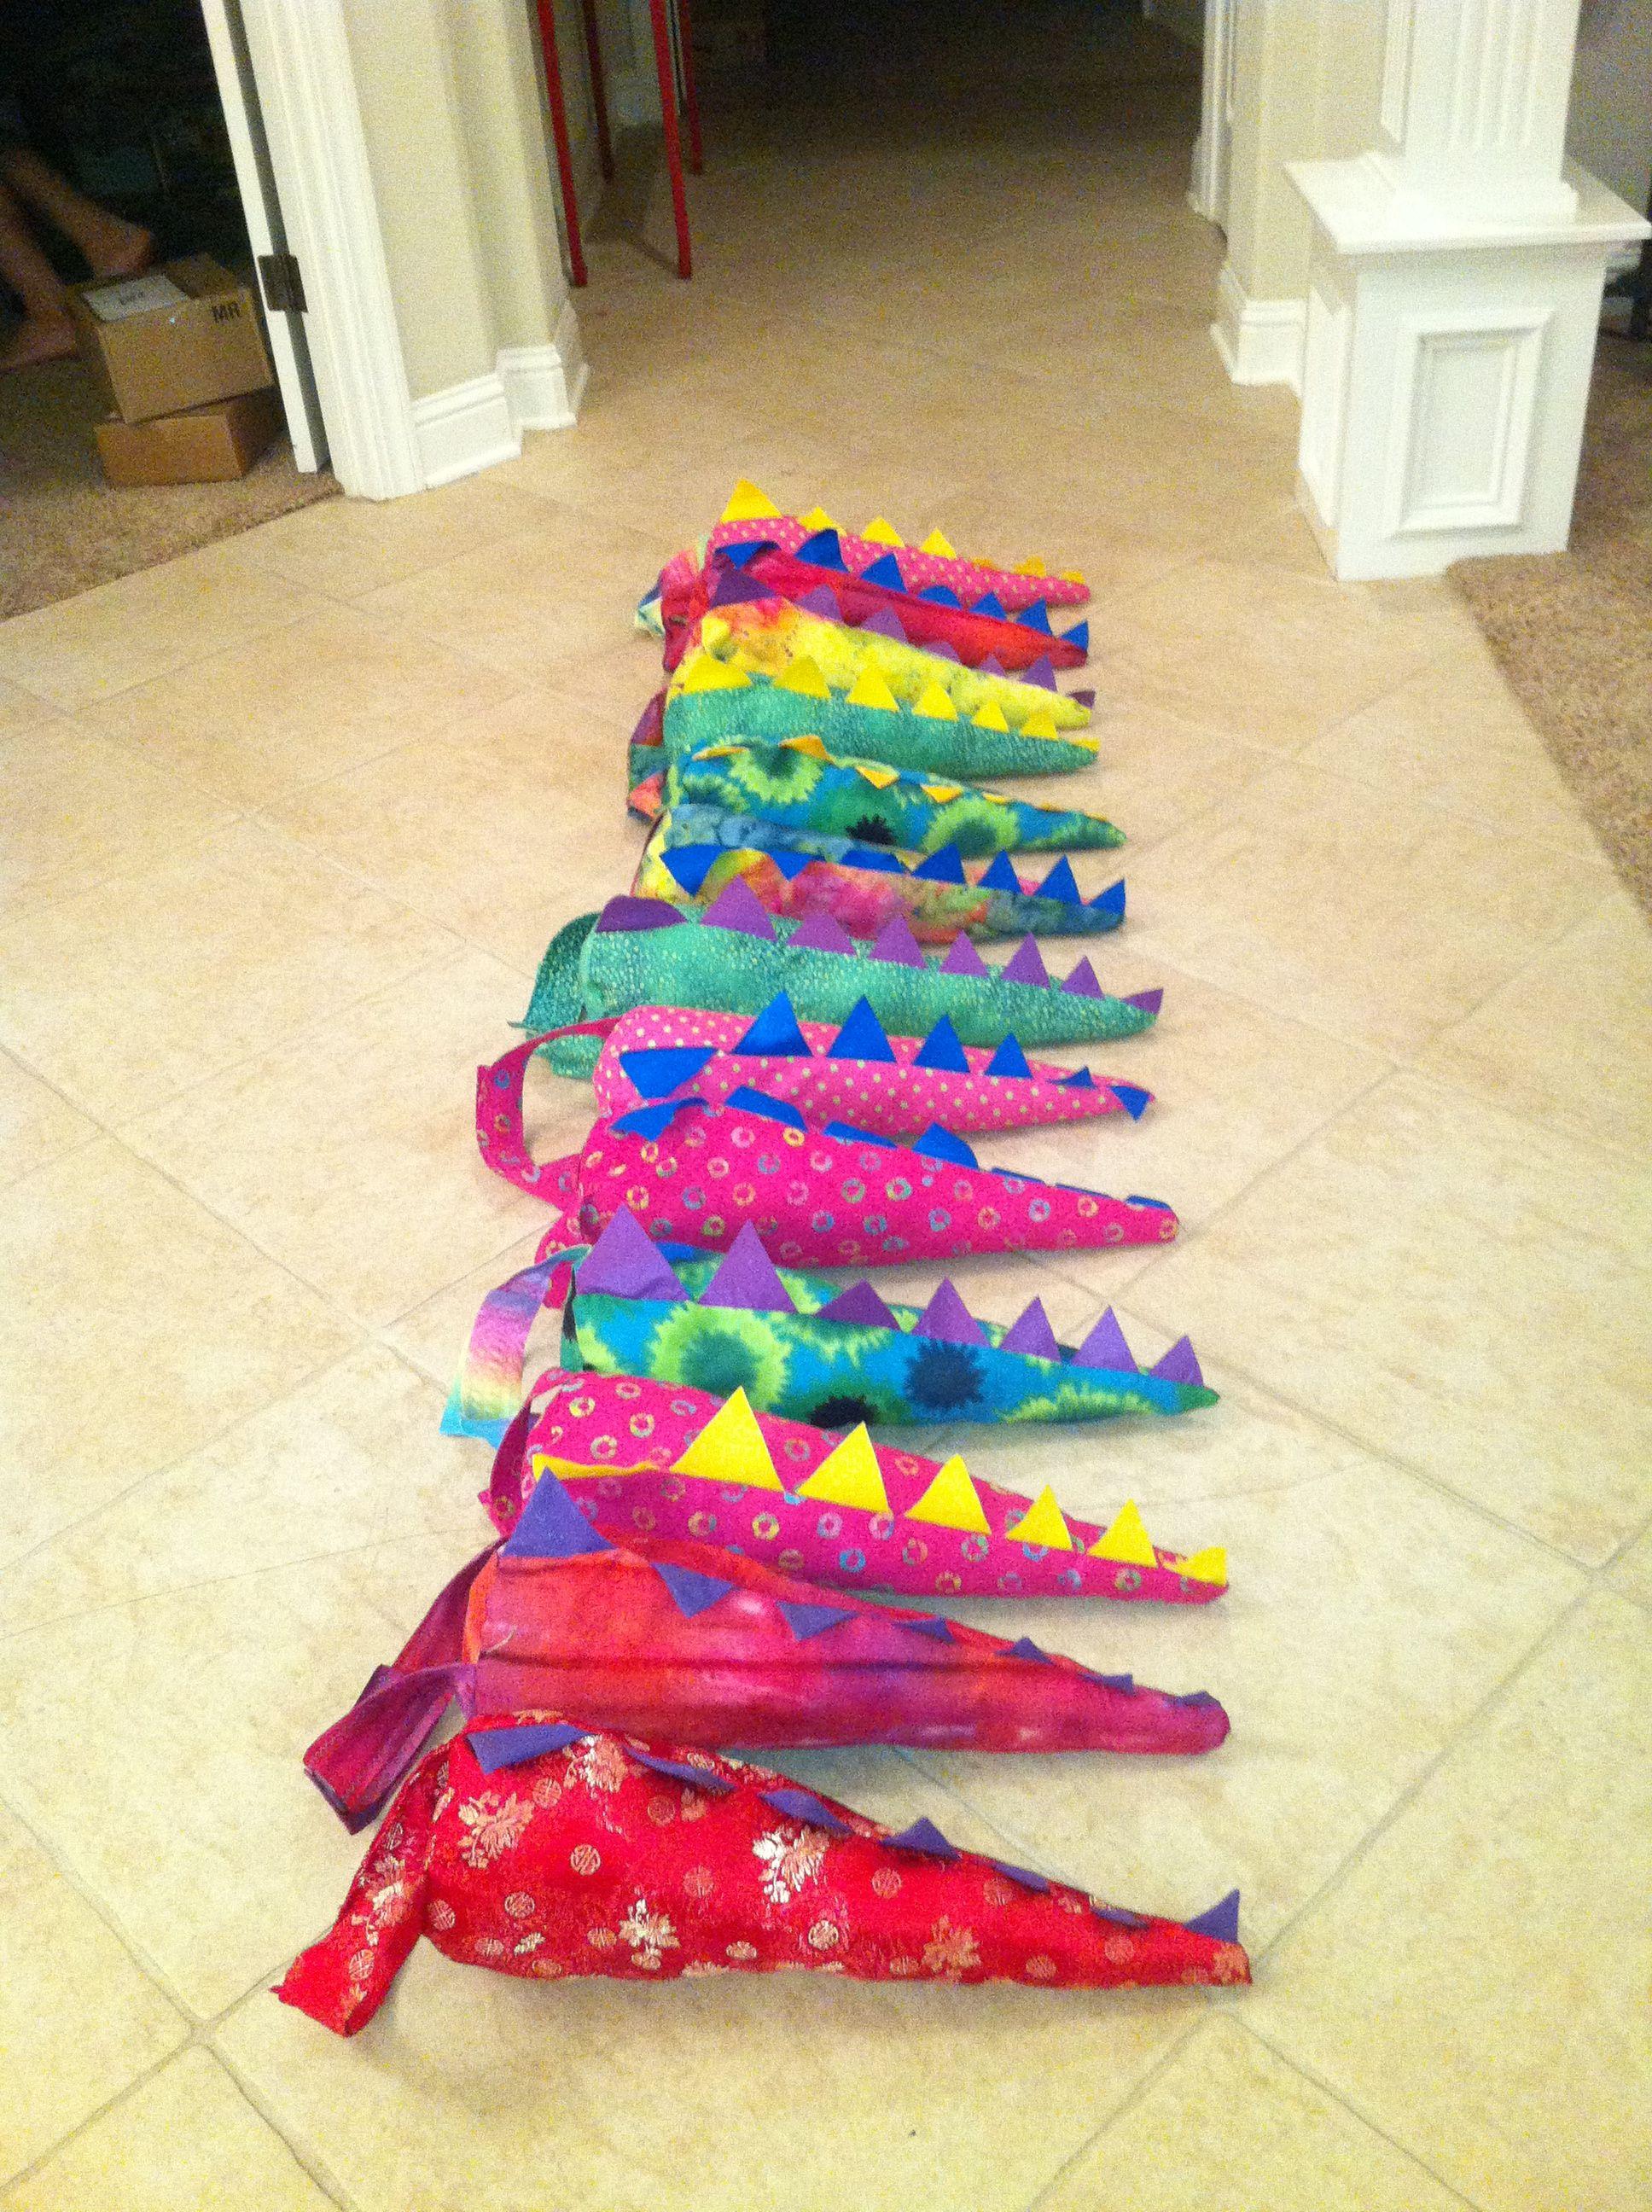 Dragon Tails Ready Dragon Themed Birthday Party Joseph 7th